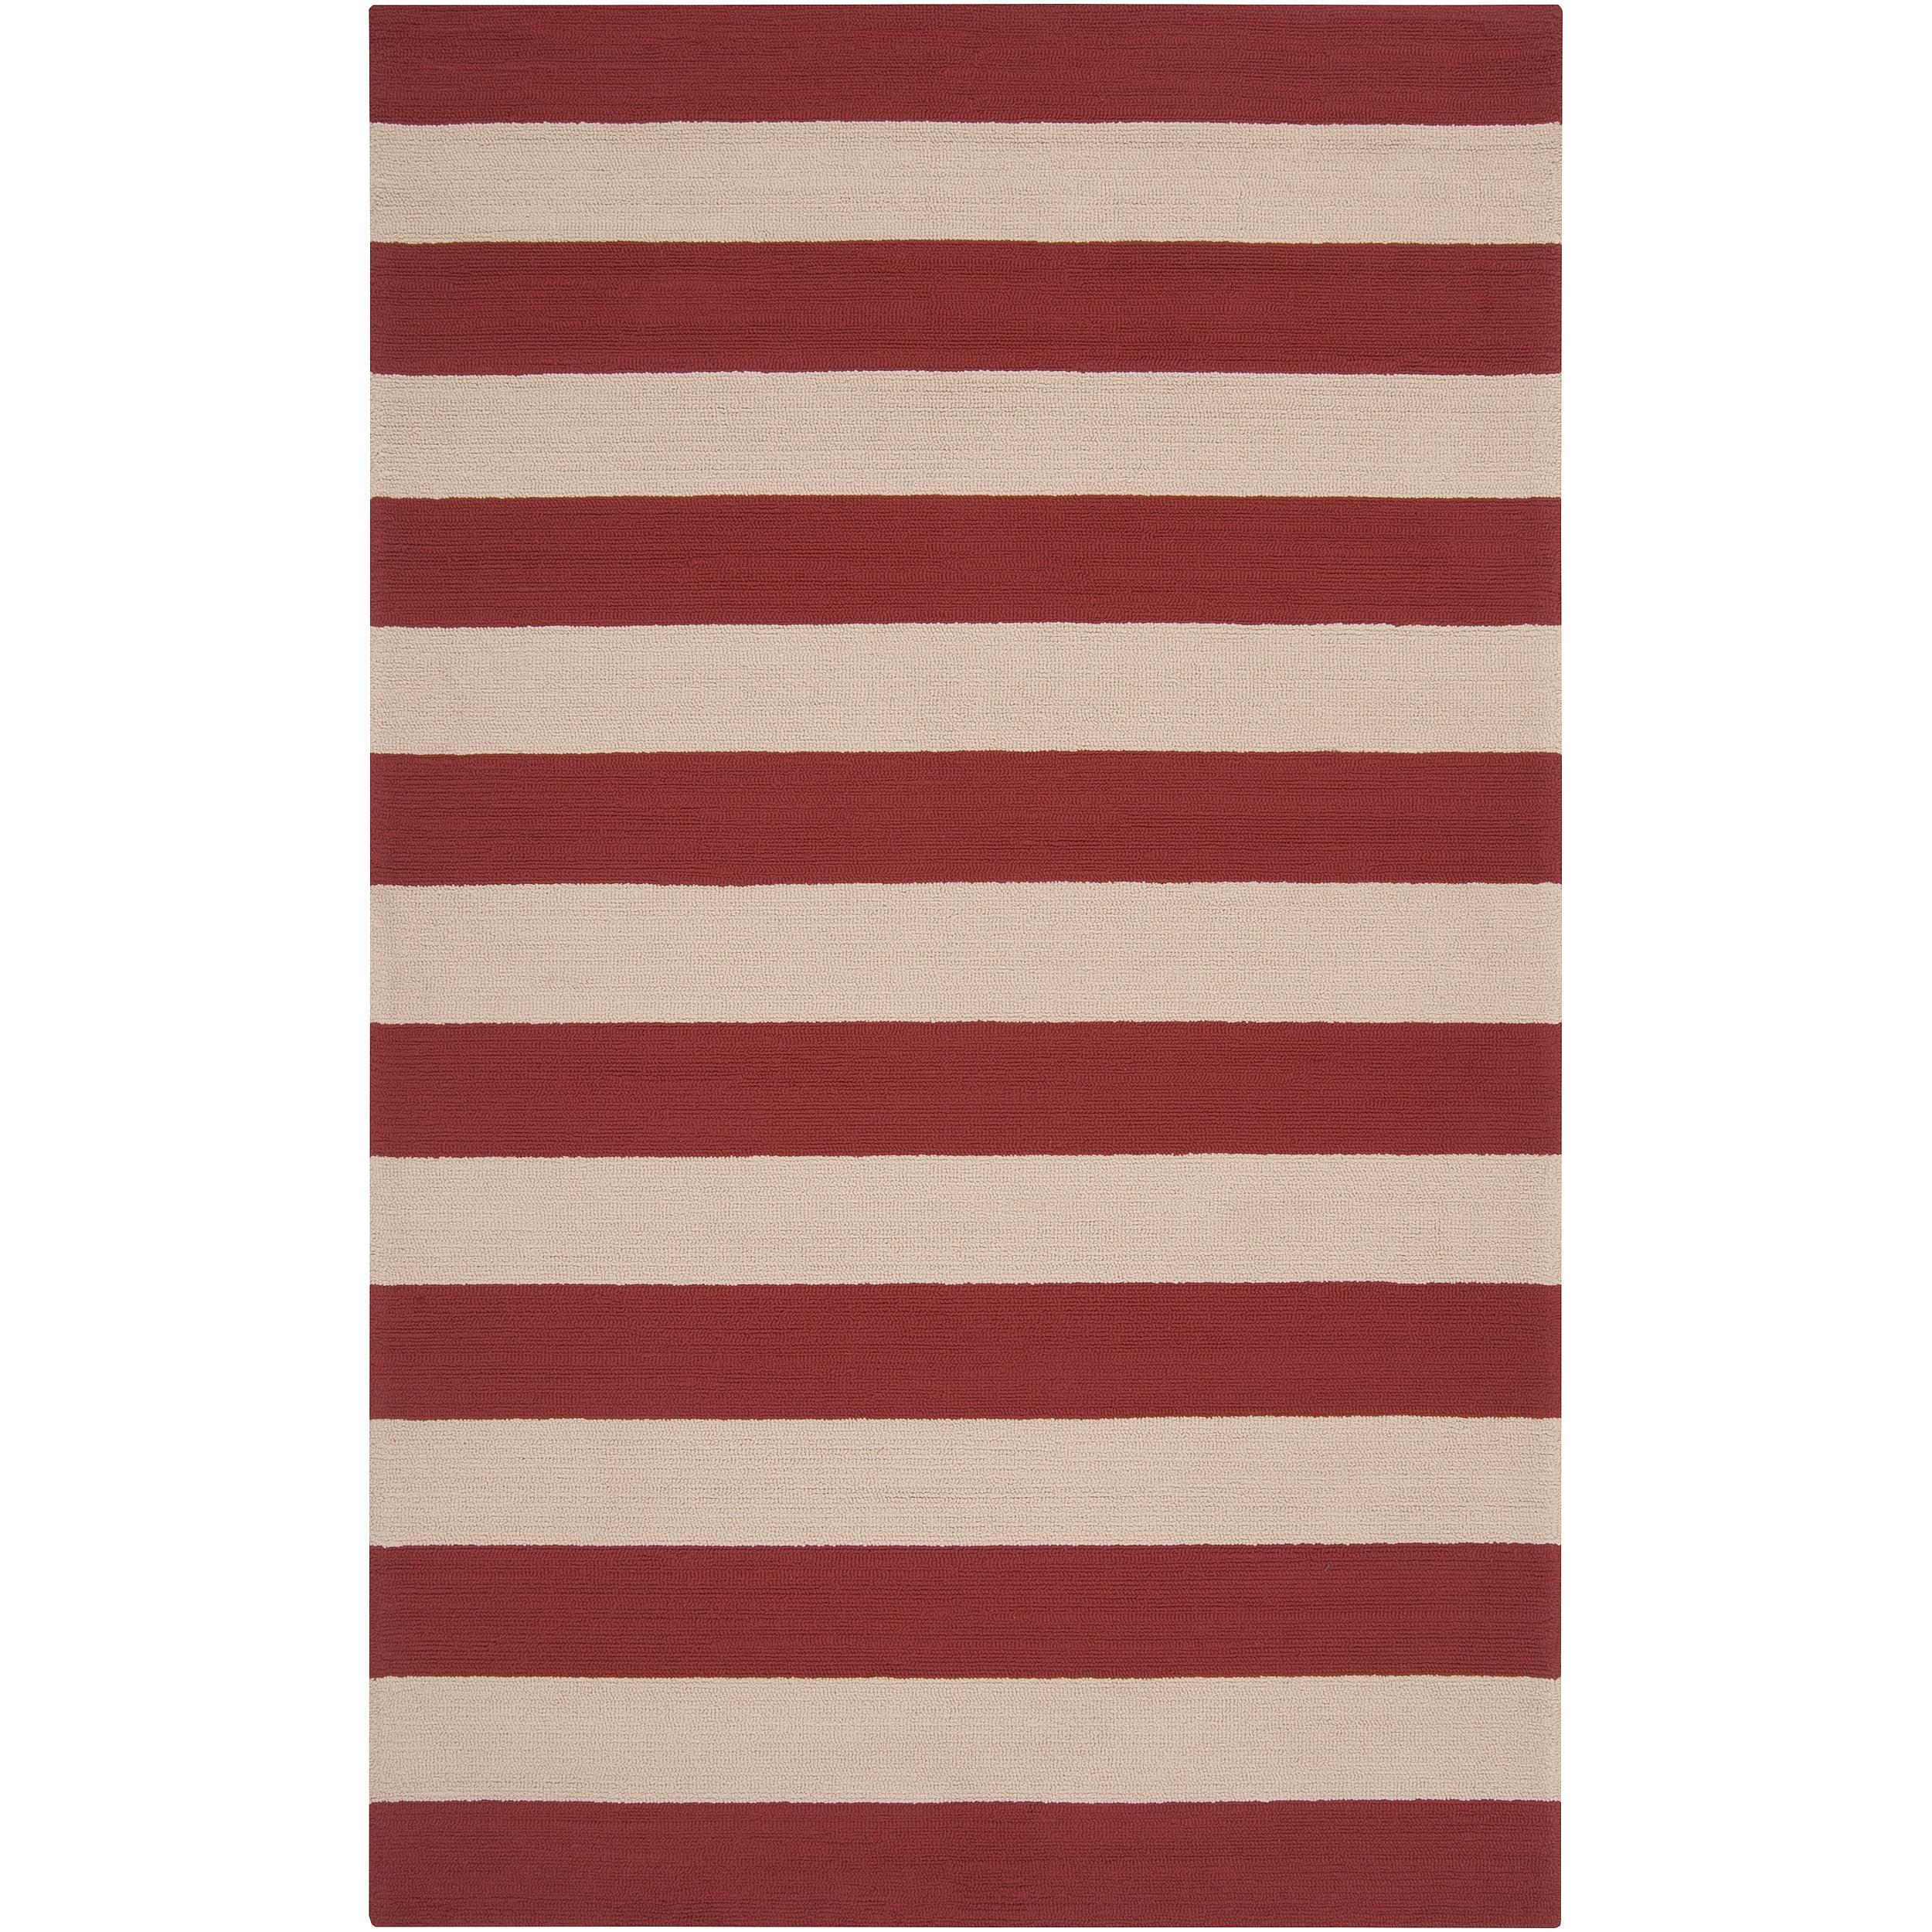 Hand-hooked Red Miette Indoor/Outdoor Stripe Area Rug - 9' x 12'